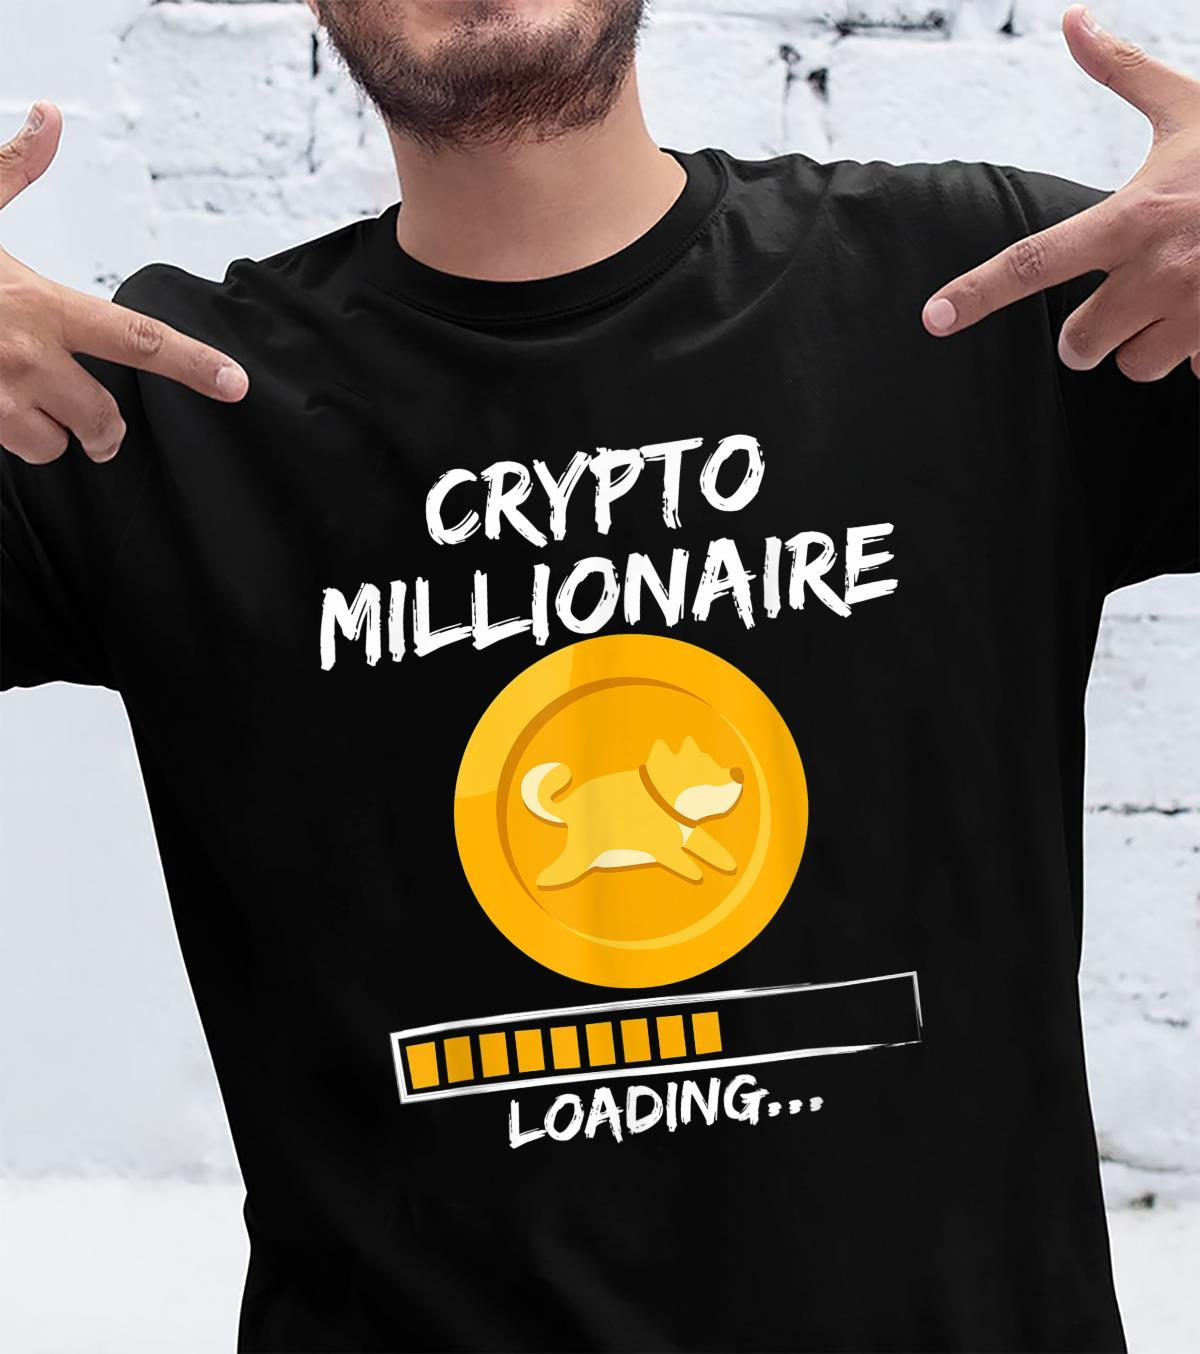 Dogecoin Millionaire Loading Crypto Cryptocurrency Shirt